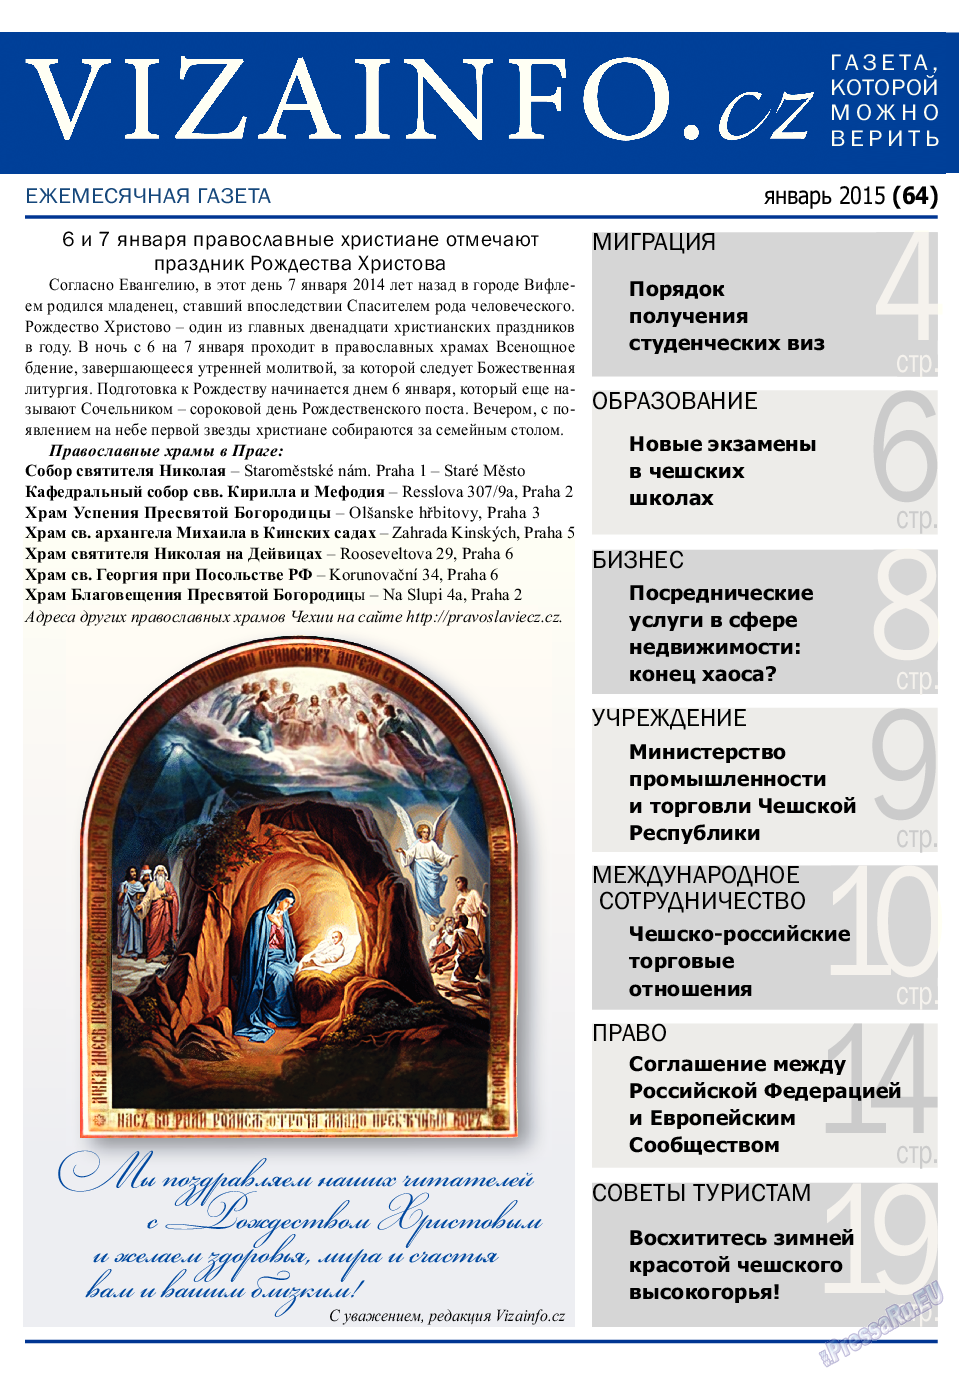 Vizainfo.cz (газета). 2014 год, номер 64, стр. 1